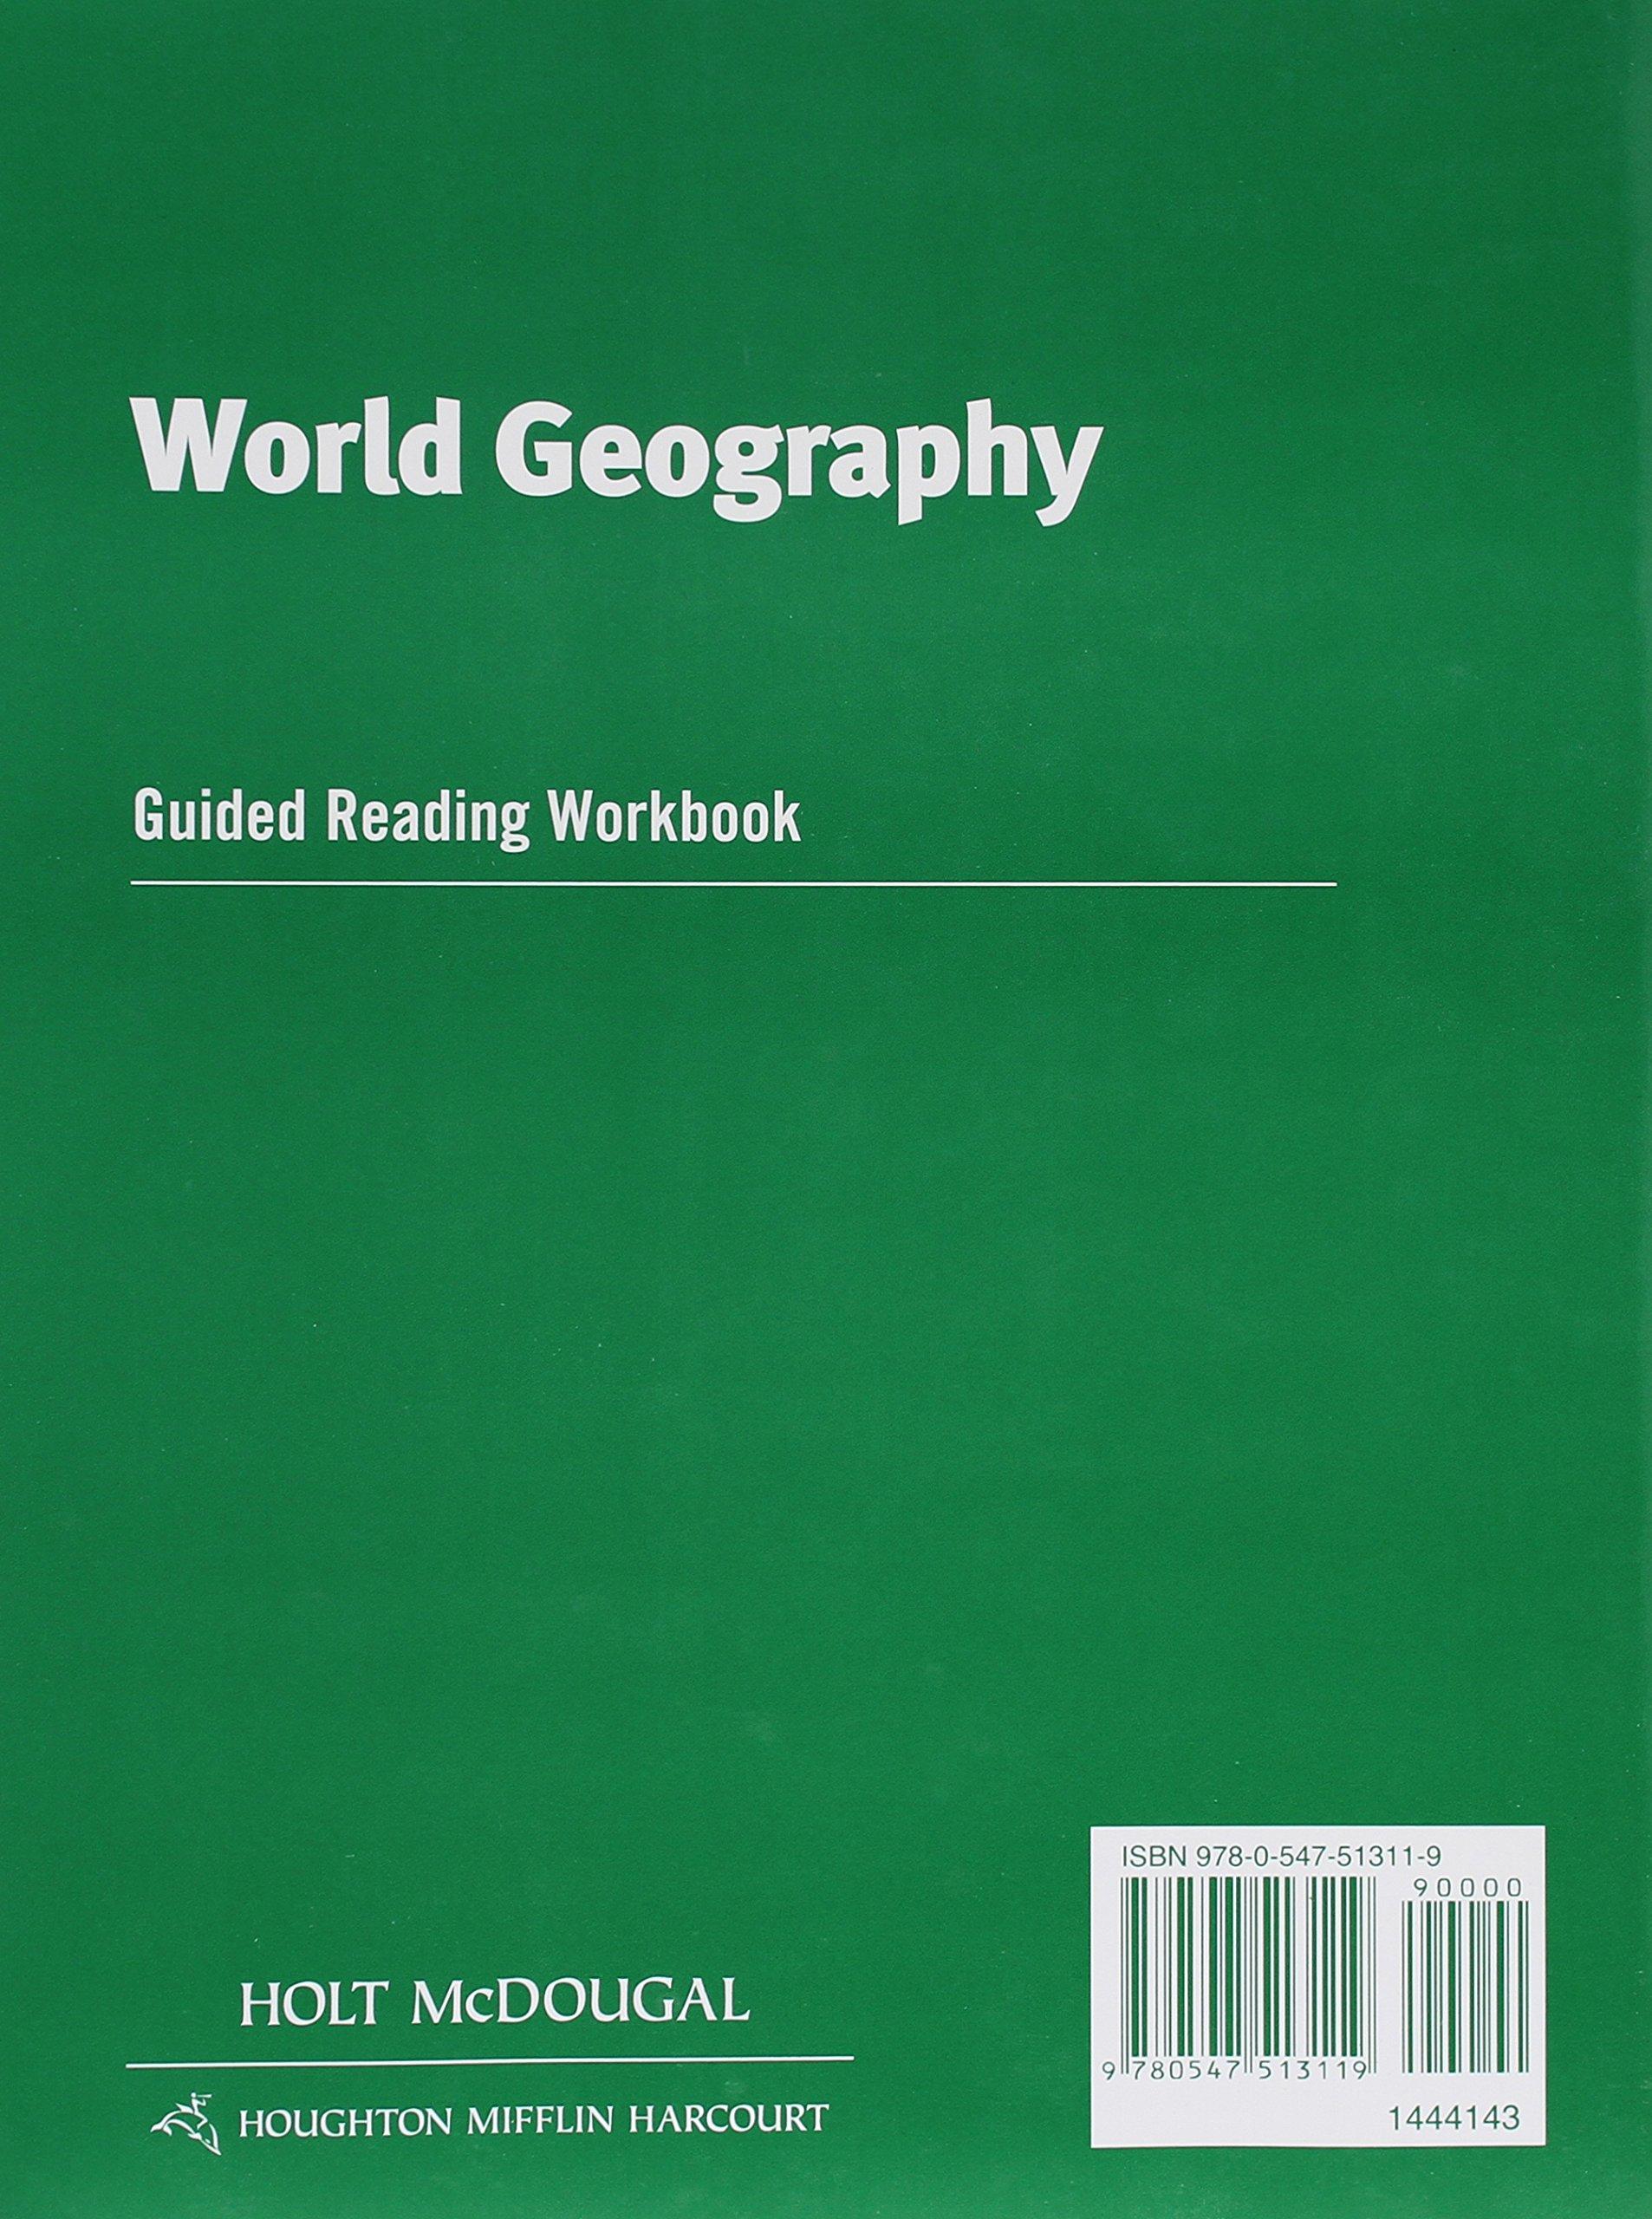 World Geography: Guided Reading Workbook: HOLT MCDOUGAL: 9780547513119:  Amazon.com: Books